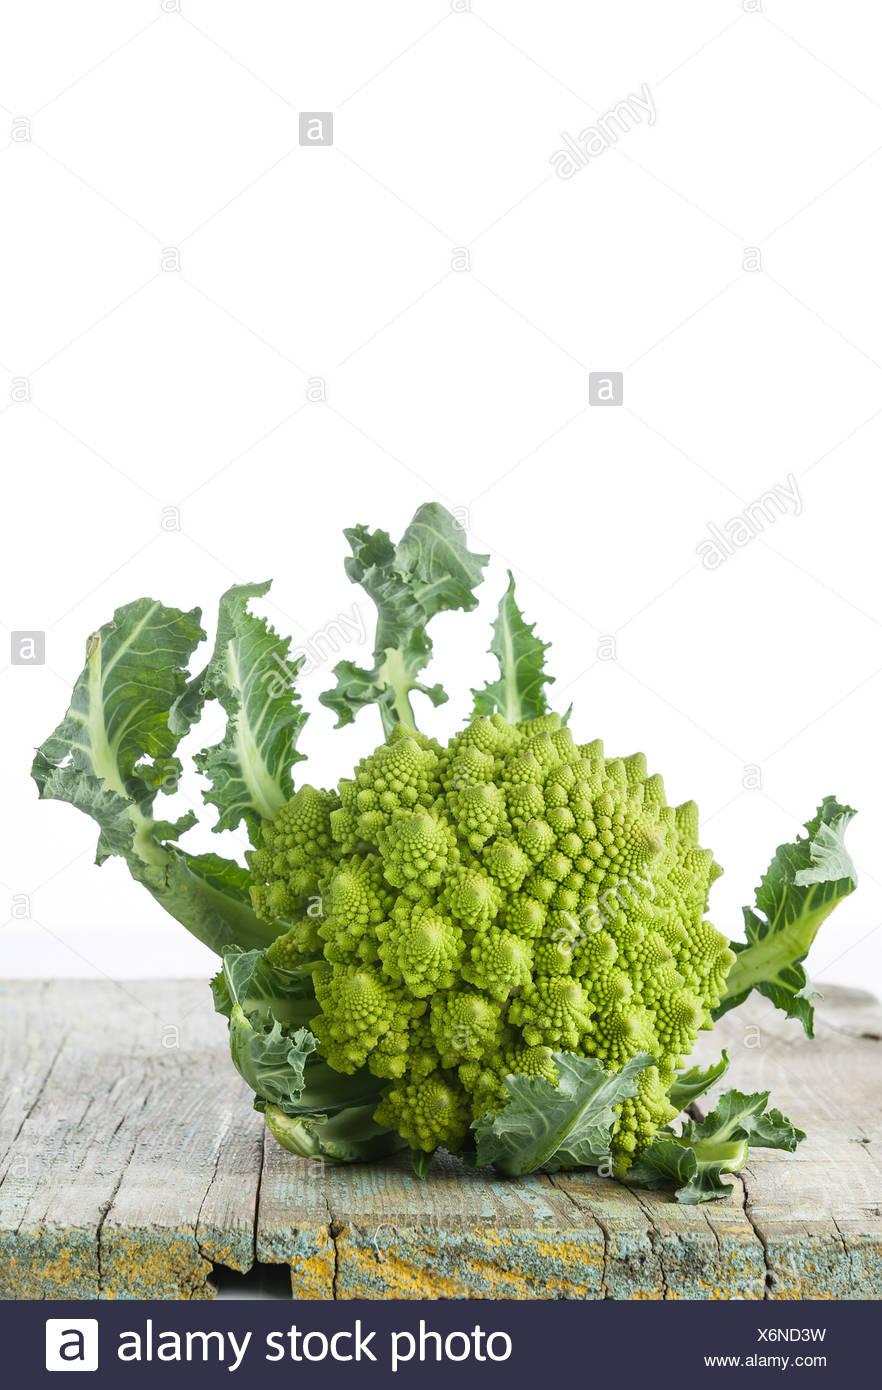 Cauliflower Romanesco on white background - Stock Image